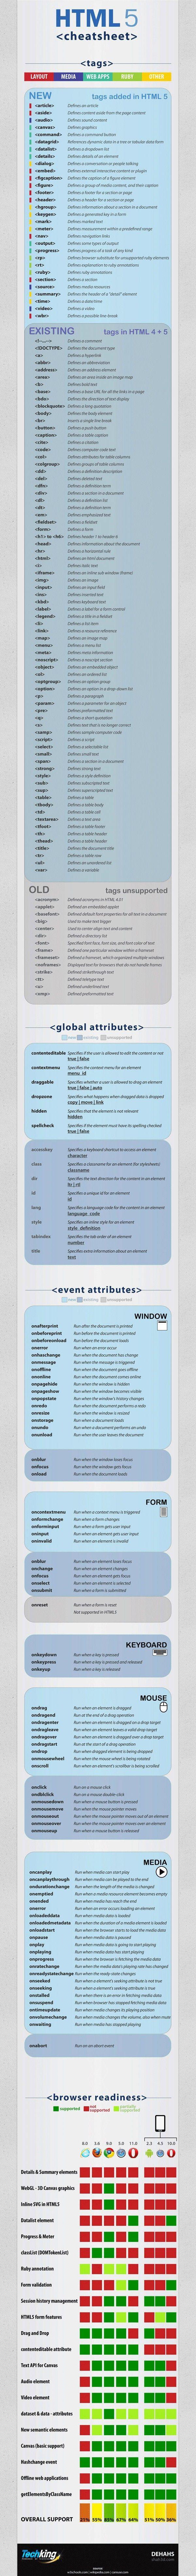 A little HTML knowledge goes a long way #Infographics www.socialmediamamma.com